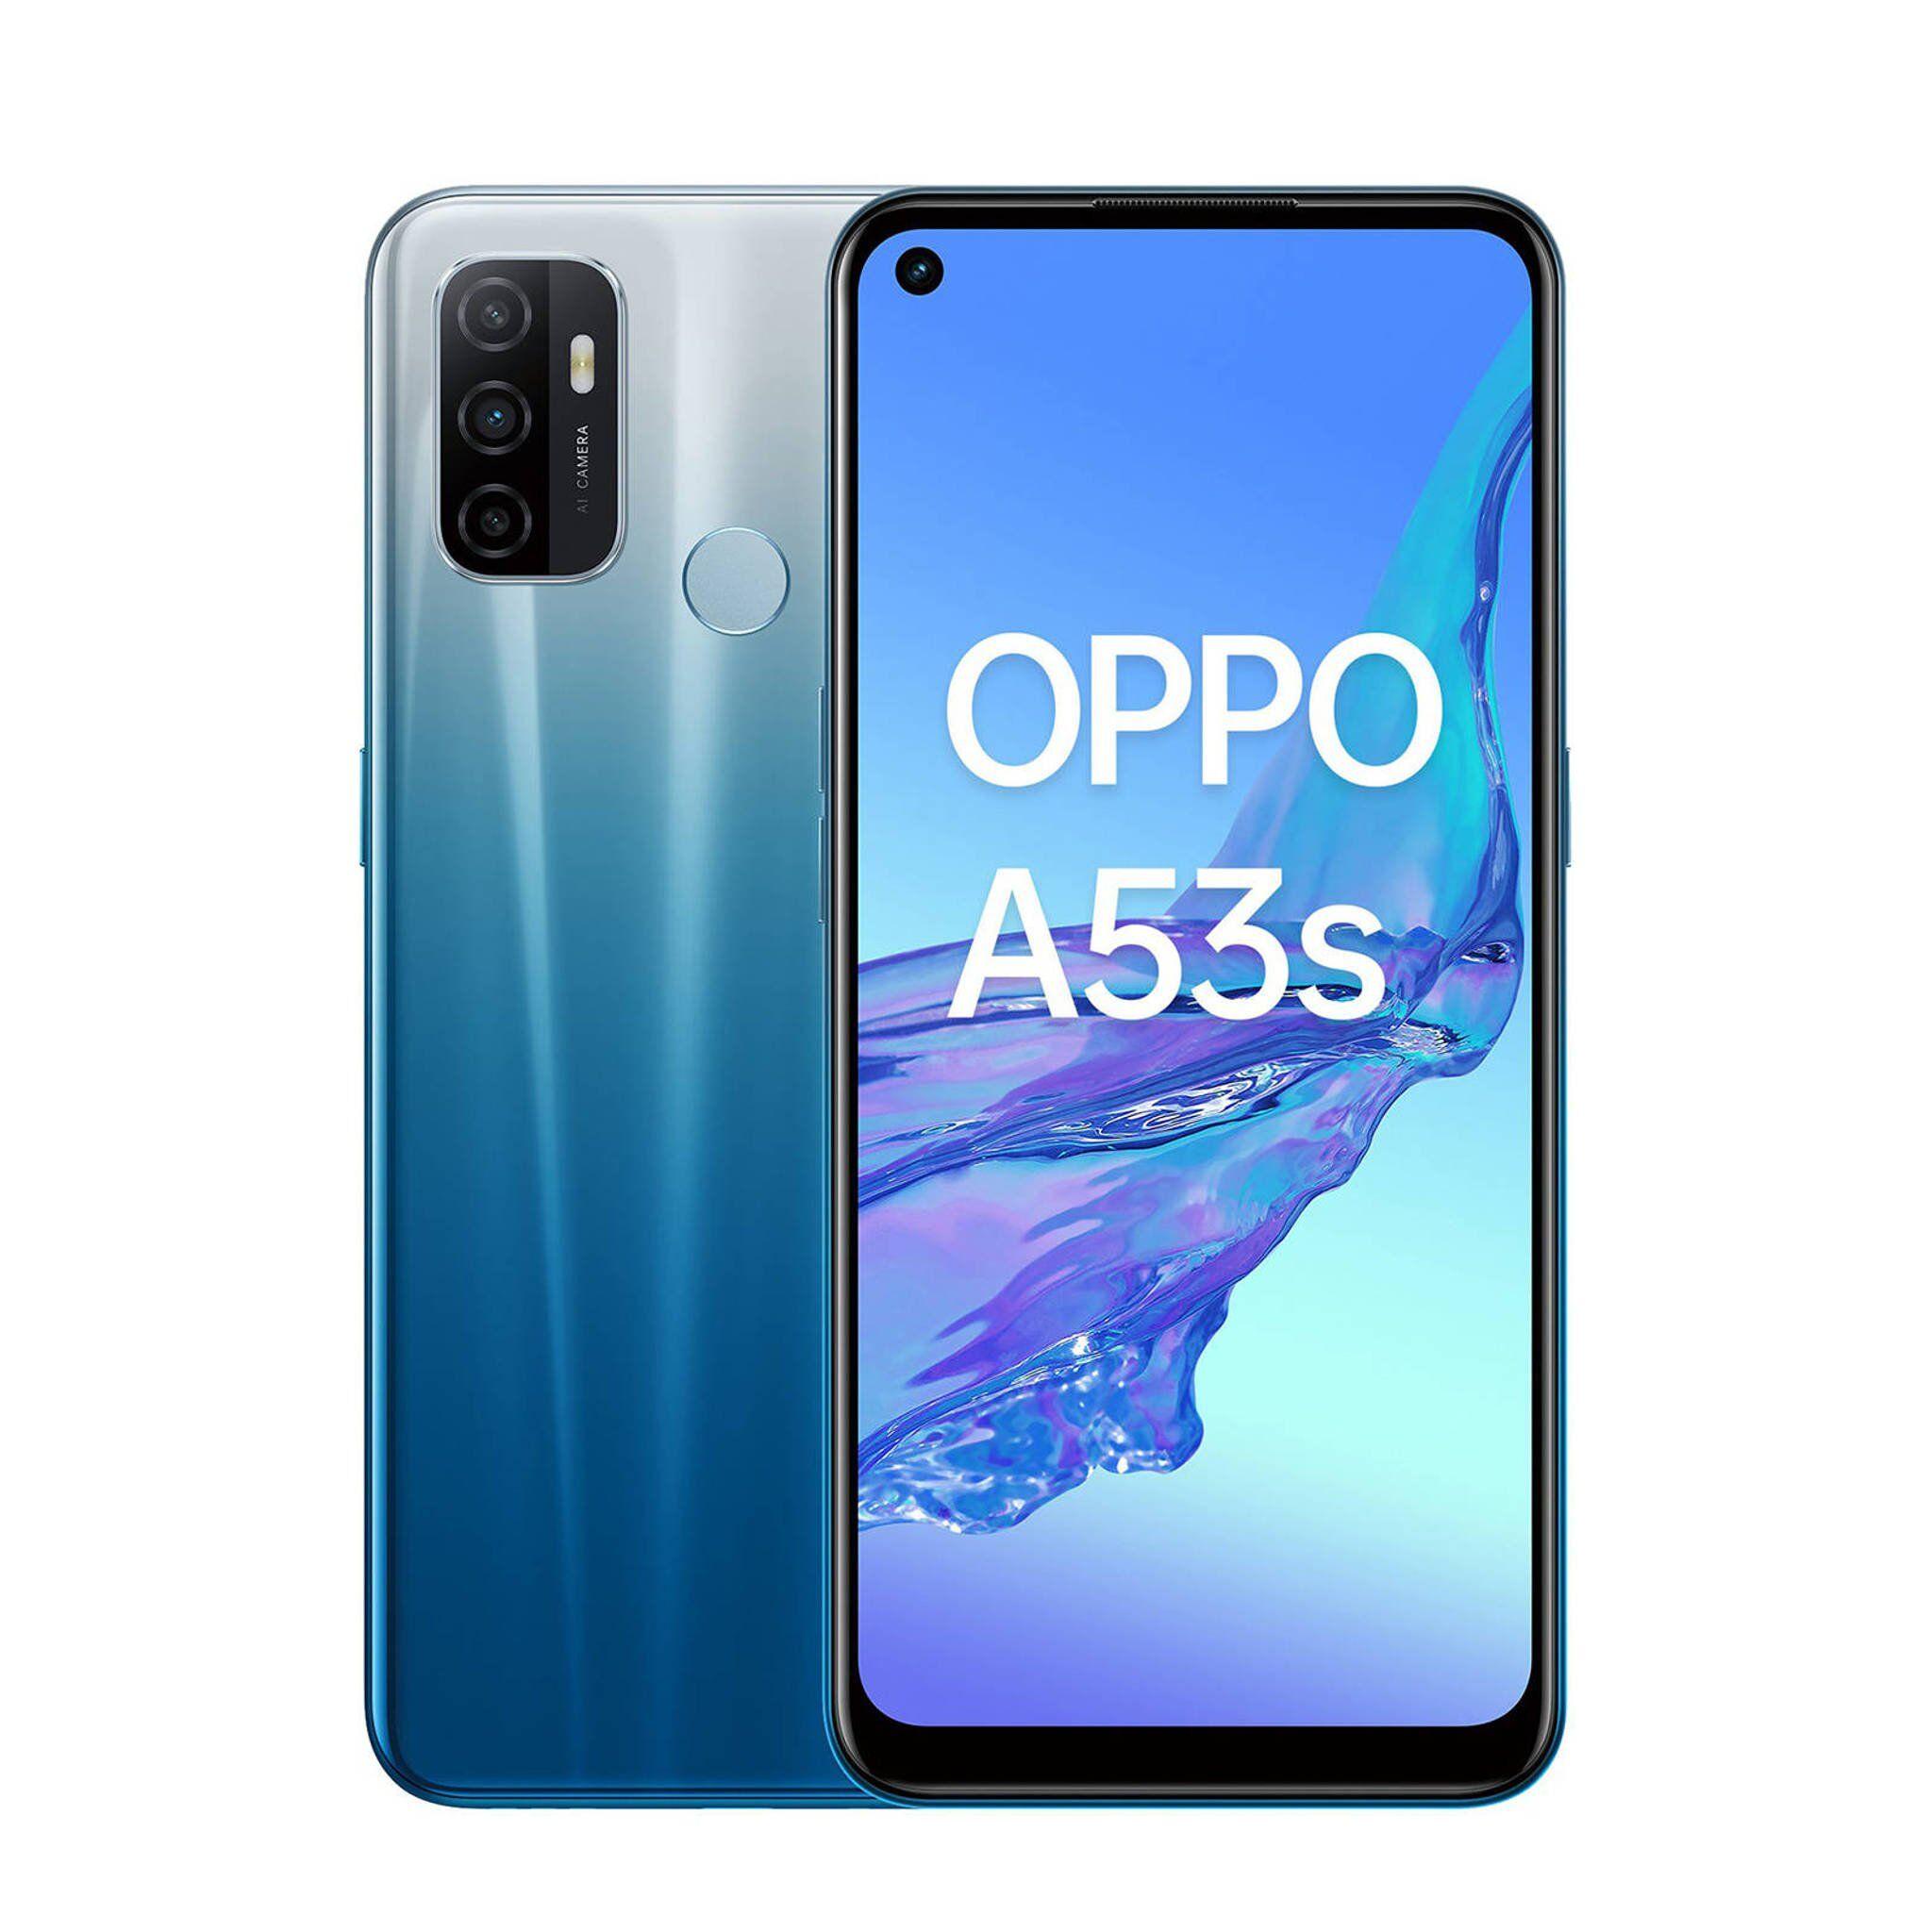 Oppo A53s Dual Sim 4GB RAM 128GB - Blue